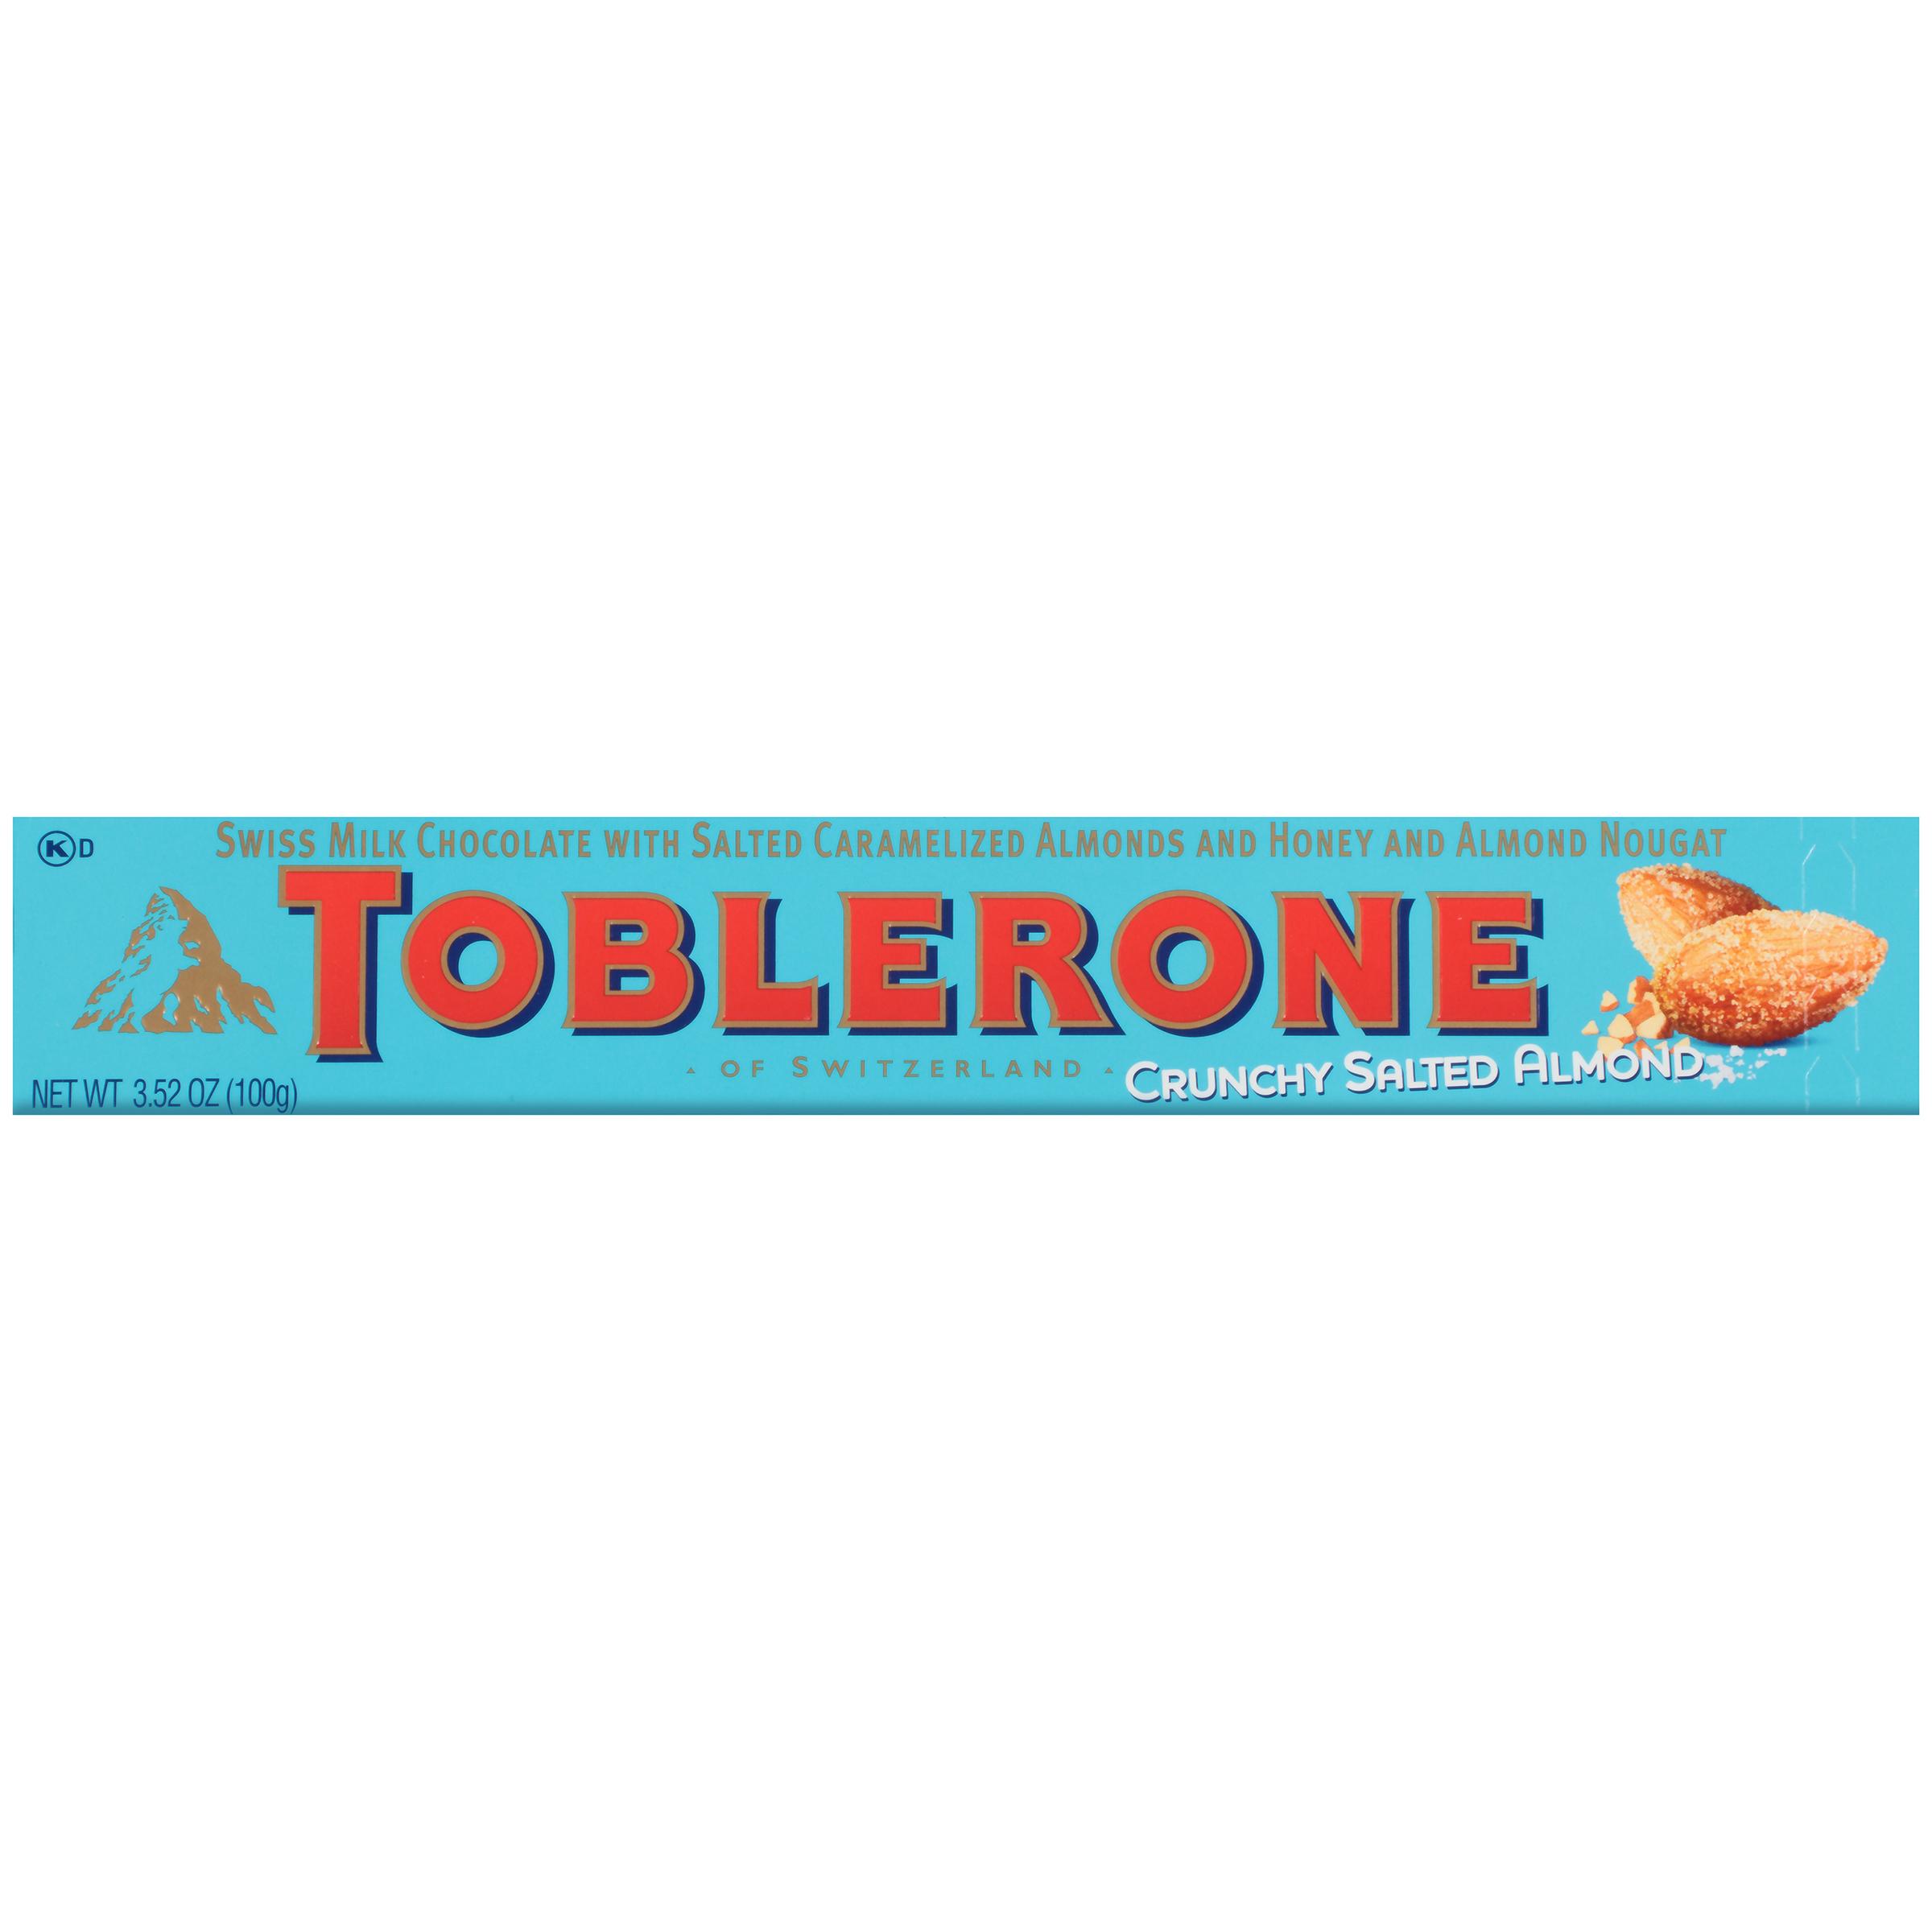 TOBLERONE Crunchy Almond With Sea Salt Chocolate 3.52 oz